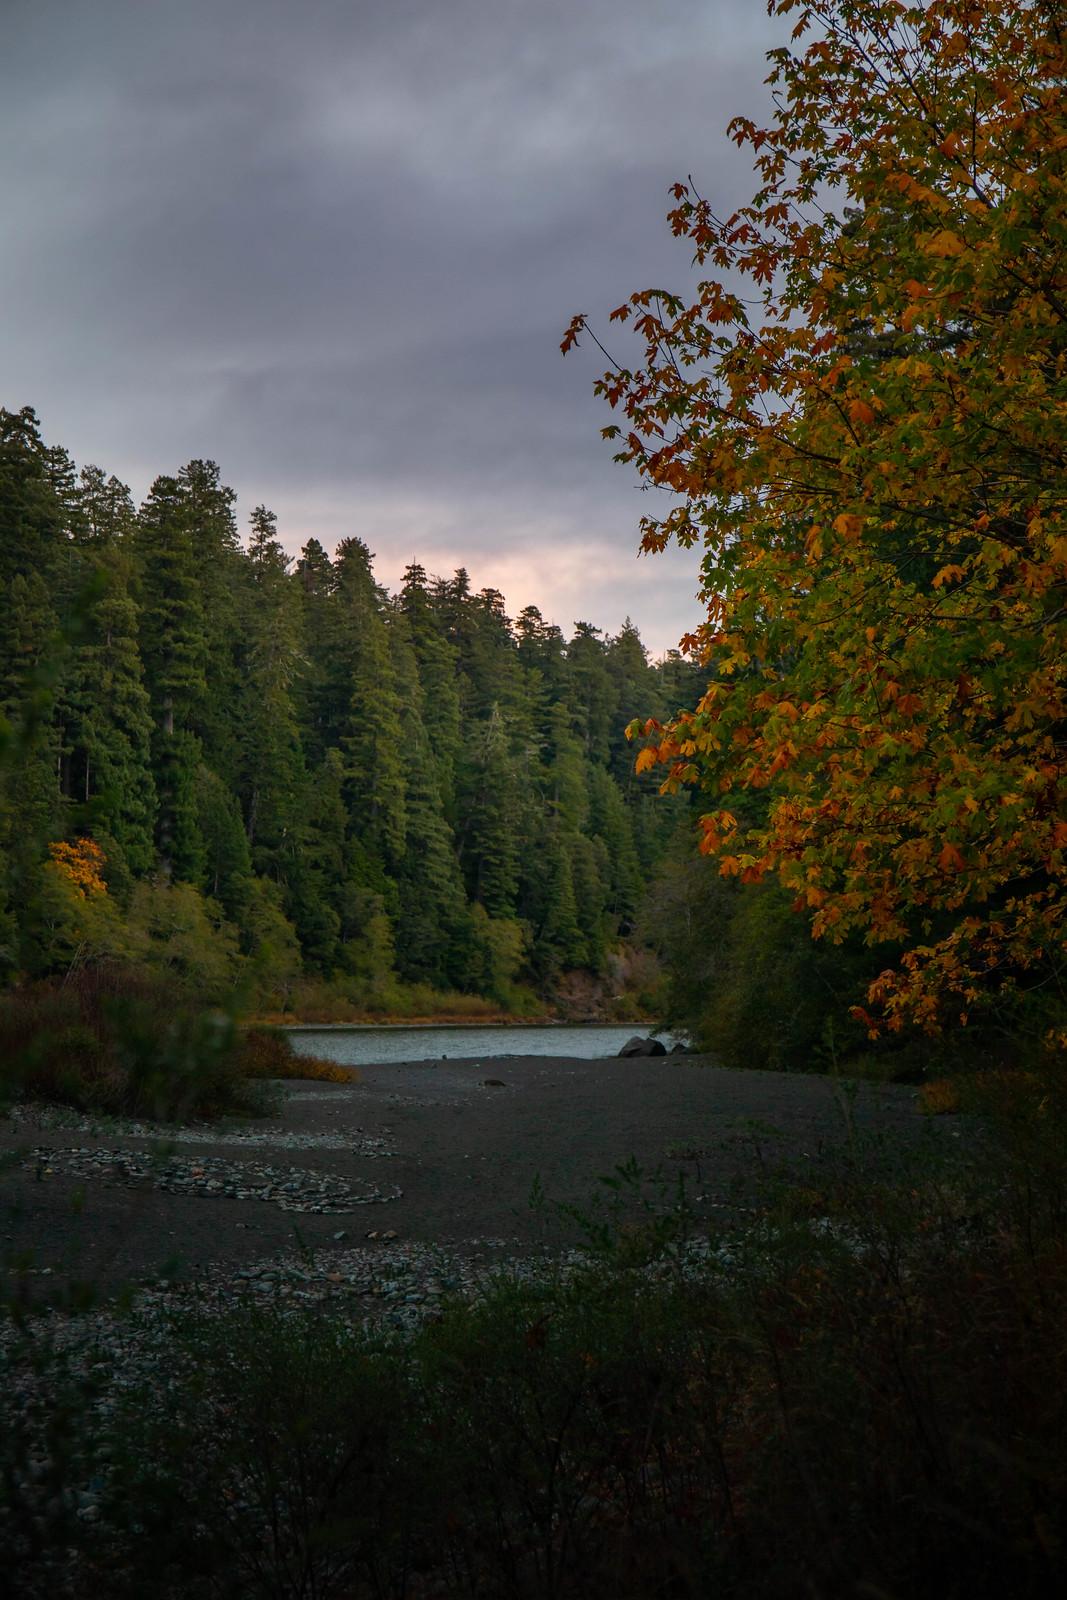 11.04. Jedediah Smith Redwoods State Park